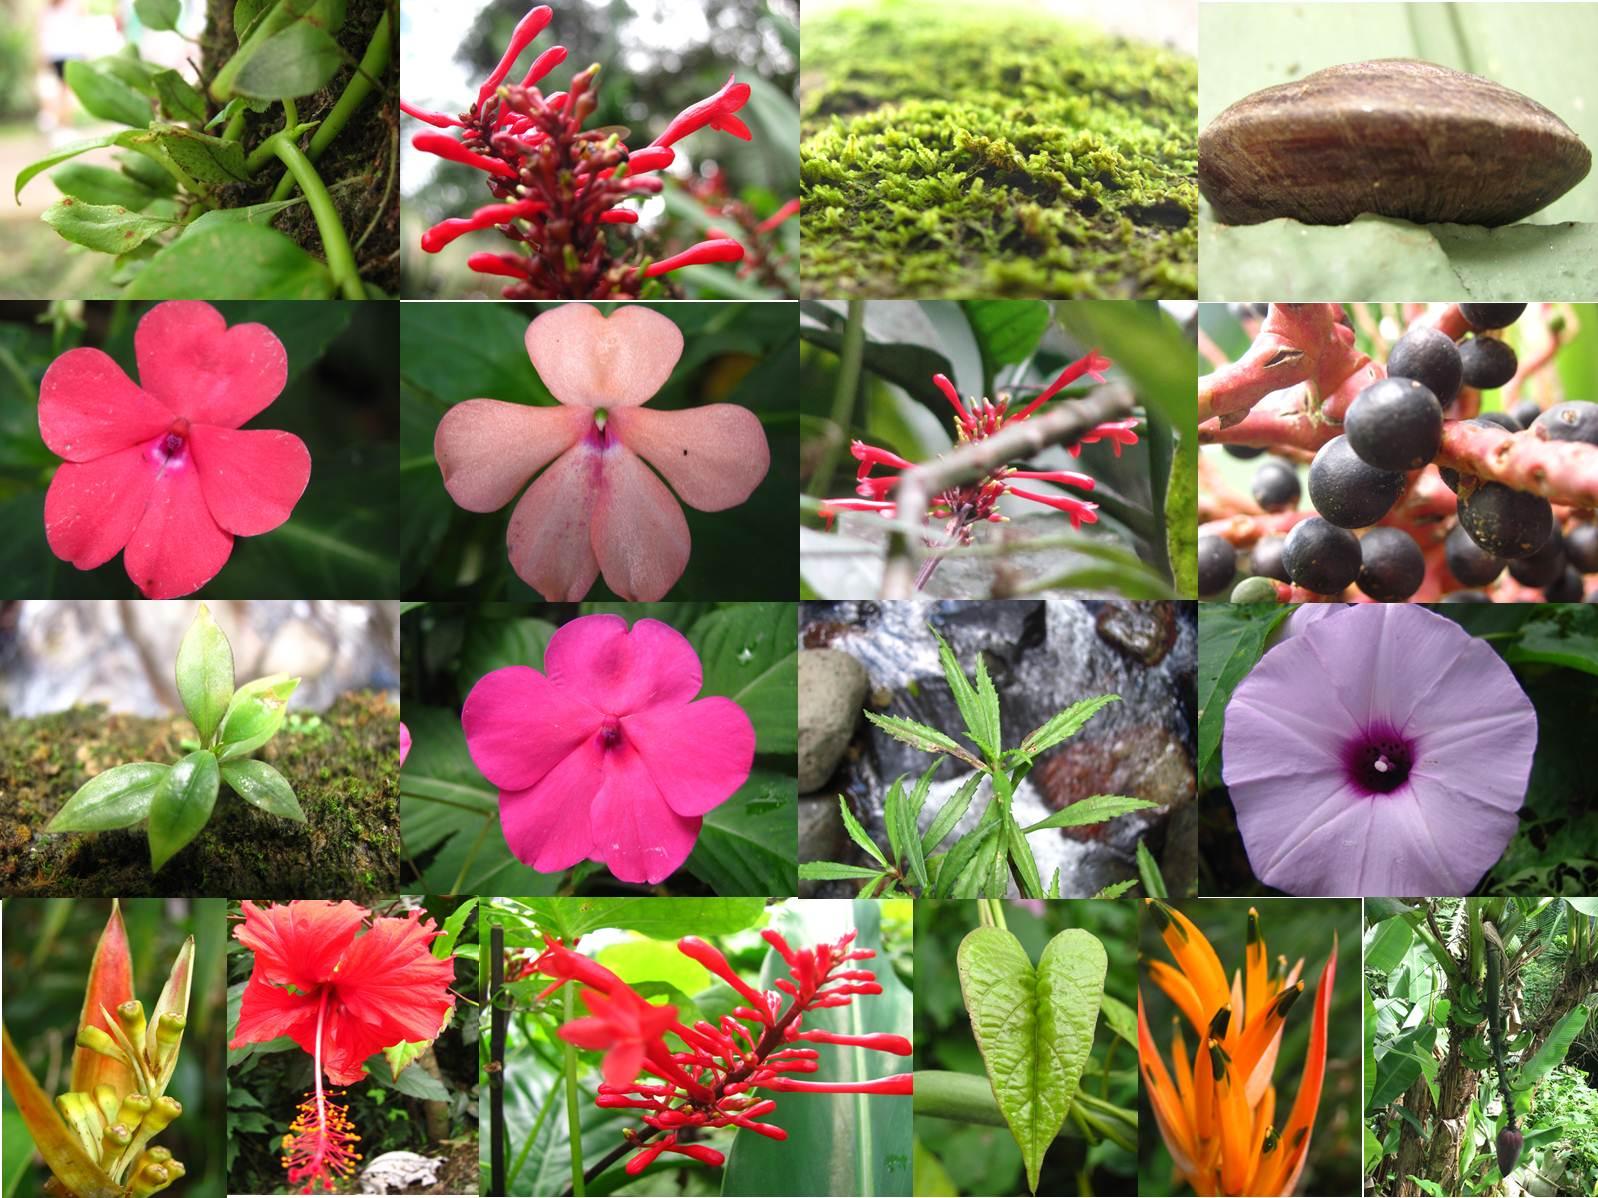 amazon rainforest plants collage. 3bpblogspotcom amazon rainforest plants collage c